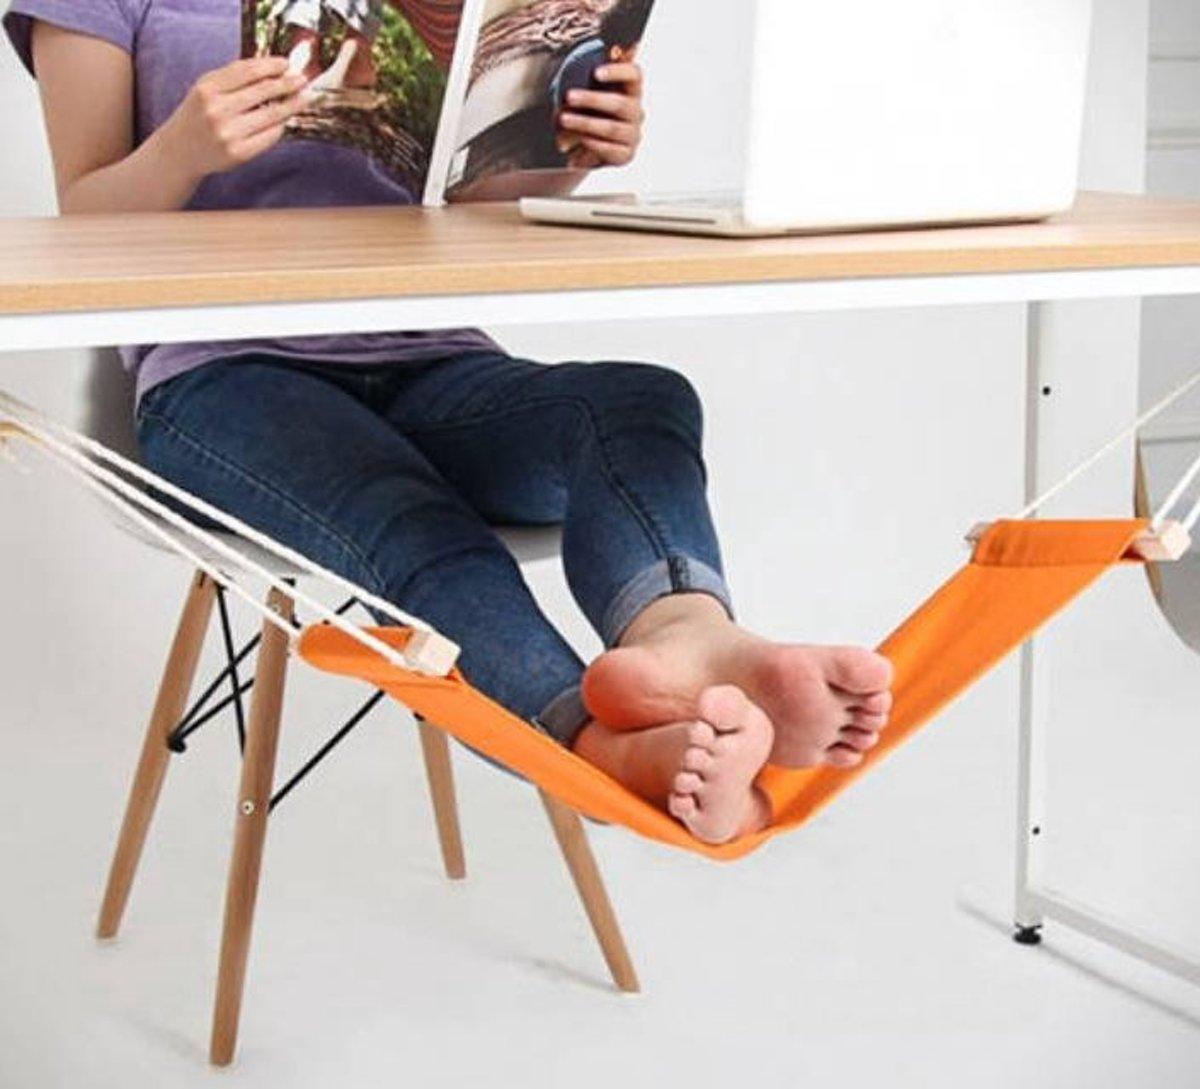 Bureau Voethangmat Relax